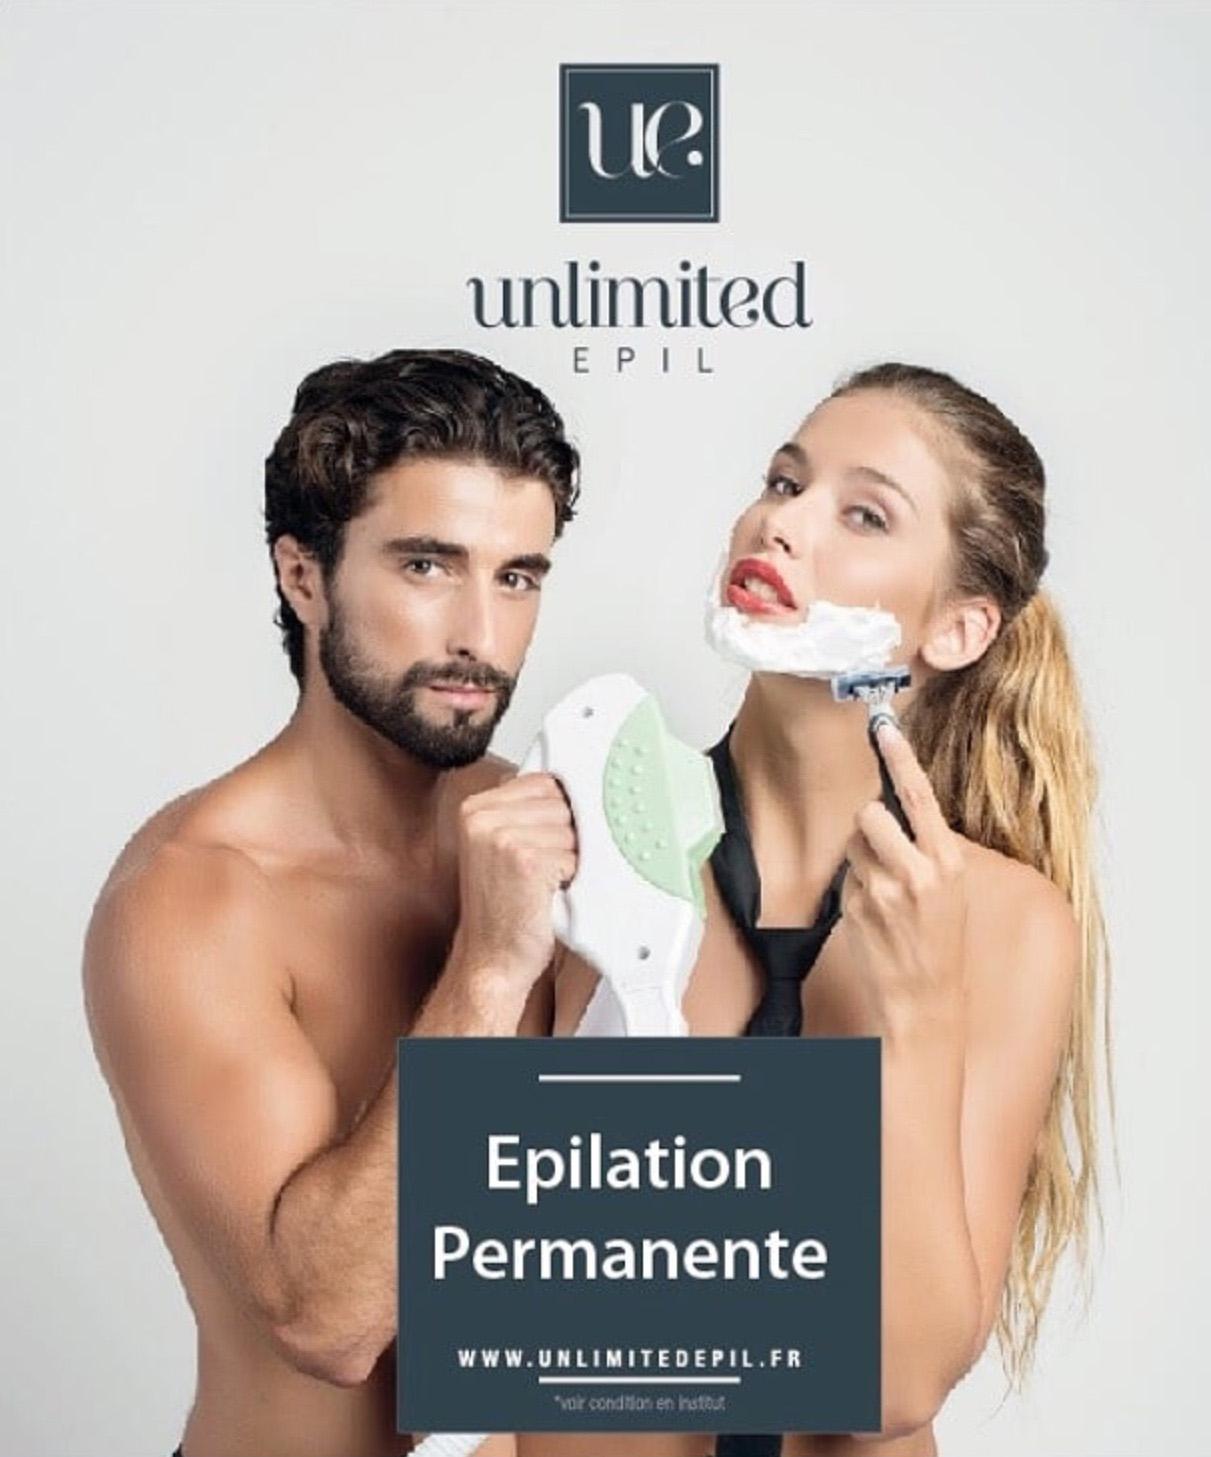 unlimited epil permanente.jpg